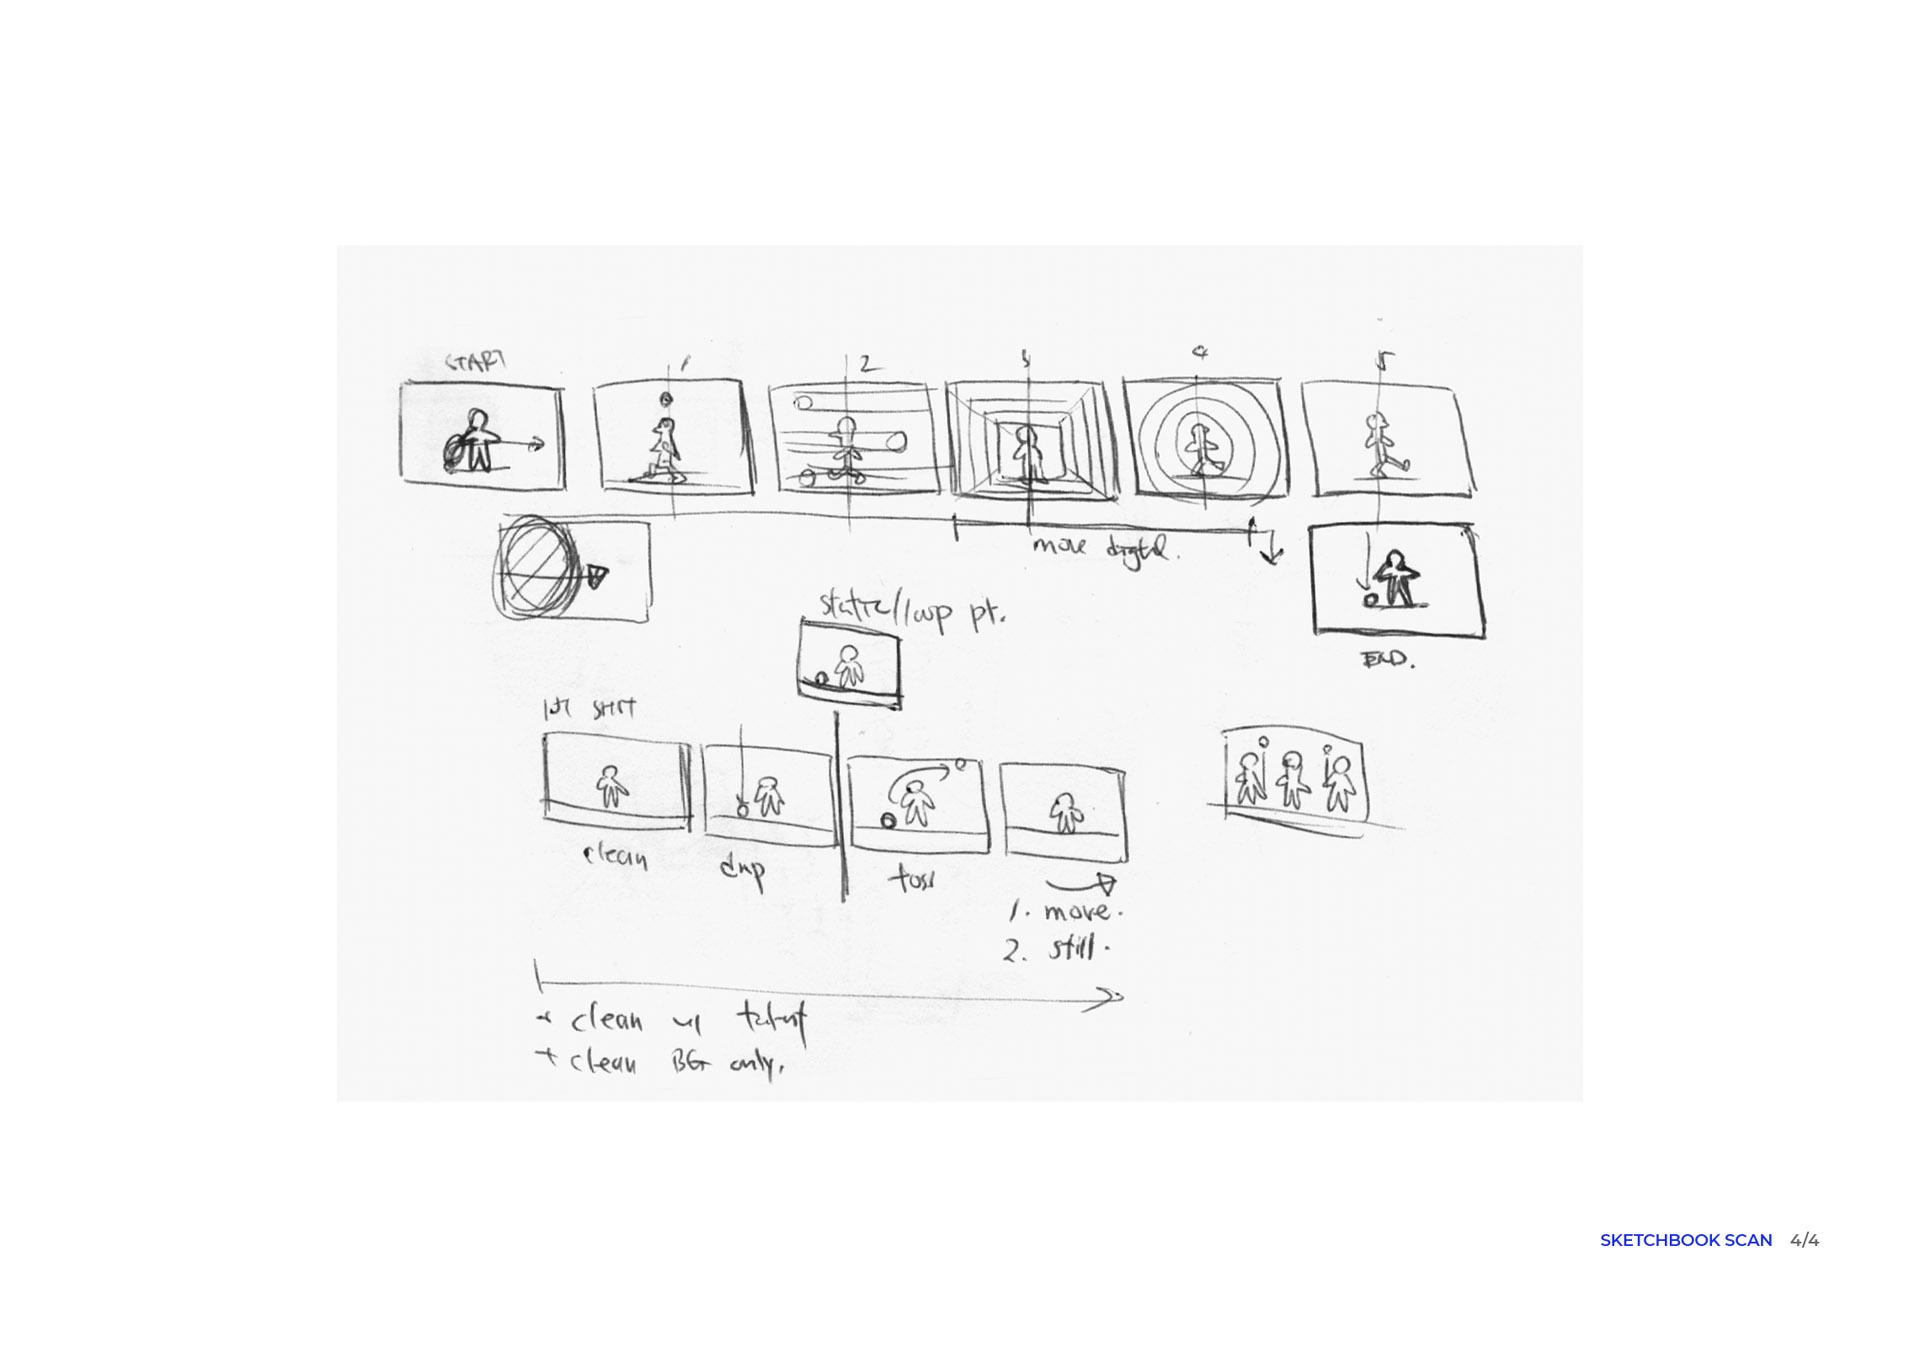 Kazuyukiishii-ecp2-sketchbook_p4-1920w